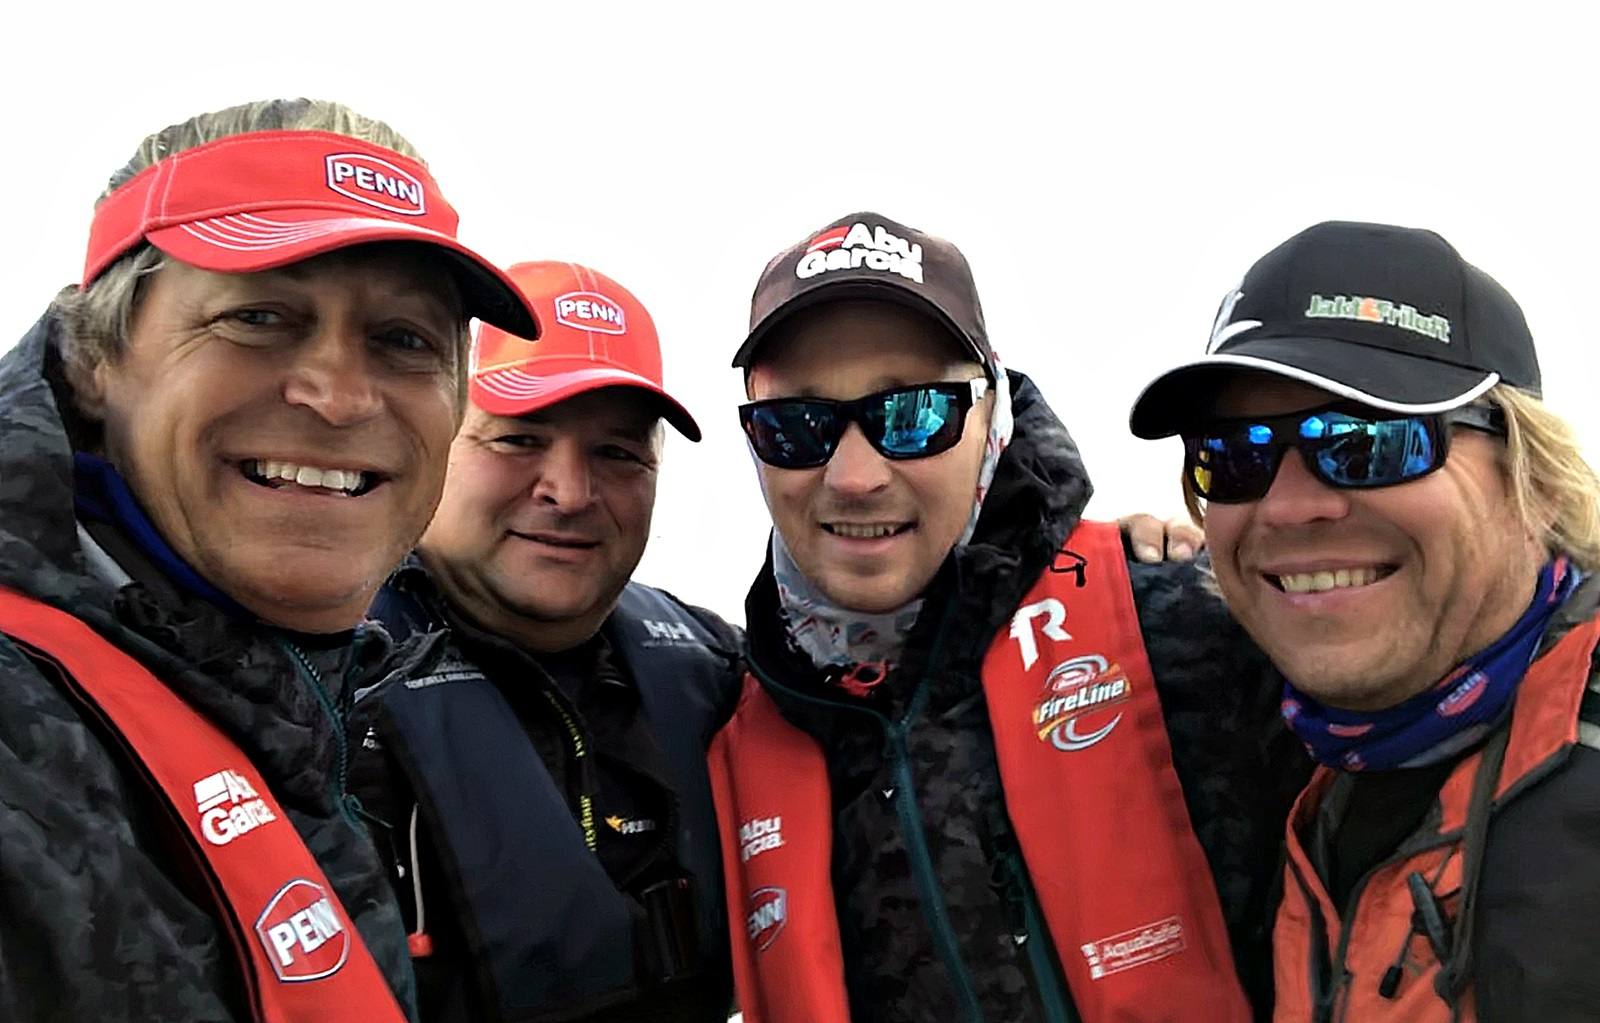 Team Abu Garcia TecnoTroll fra v: Asgeir Alvestad, Nils Andre Eigeland, Irvin Kilde og Harald Nyland